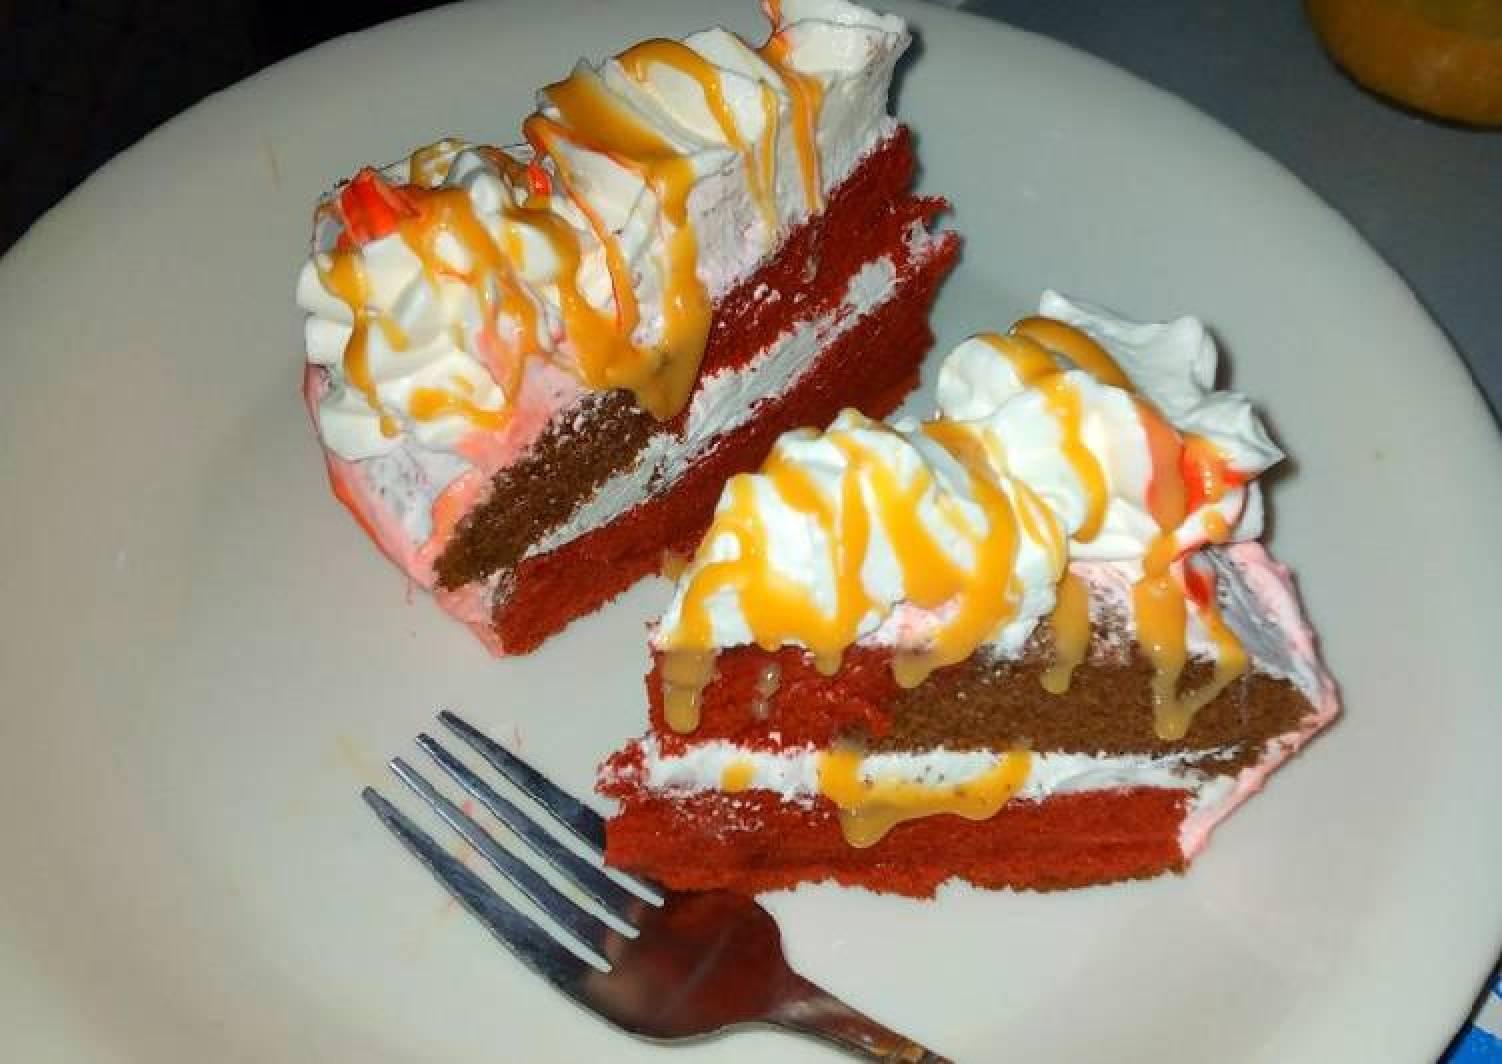 Red velvet and chocolate sponge cake